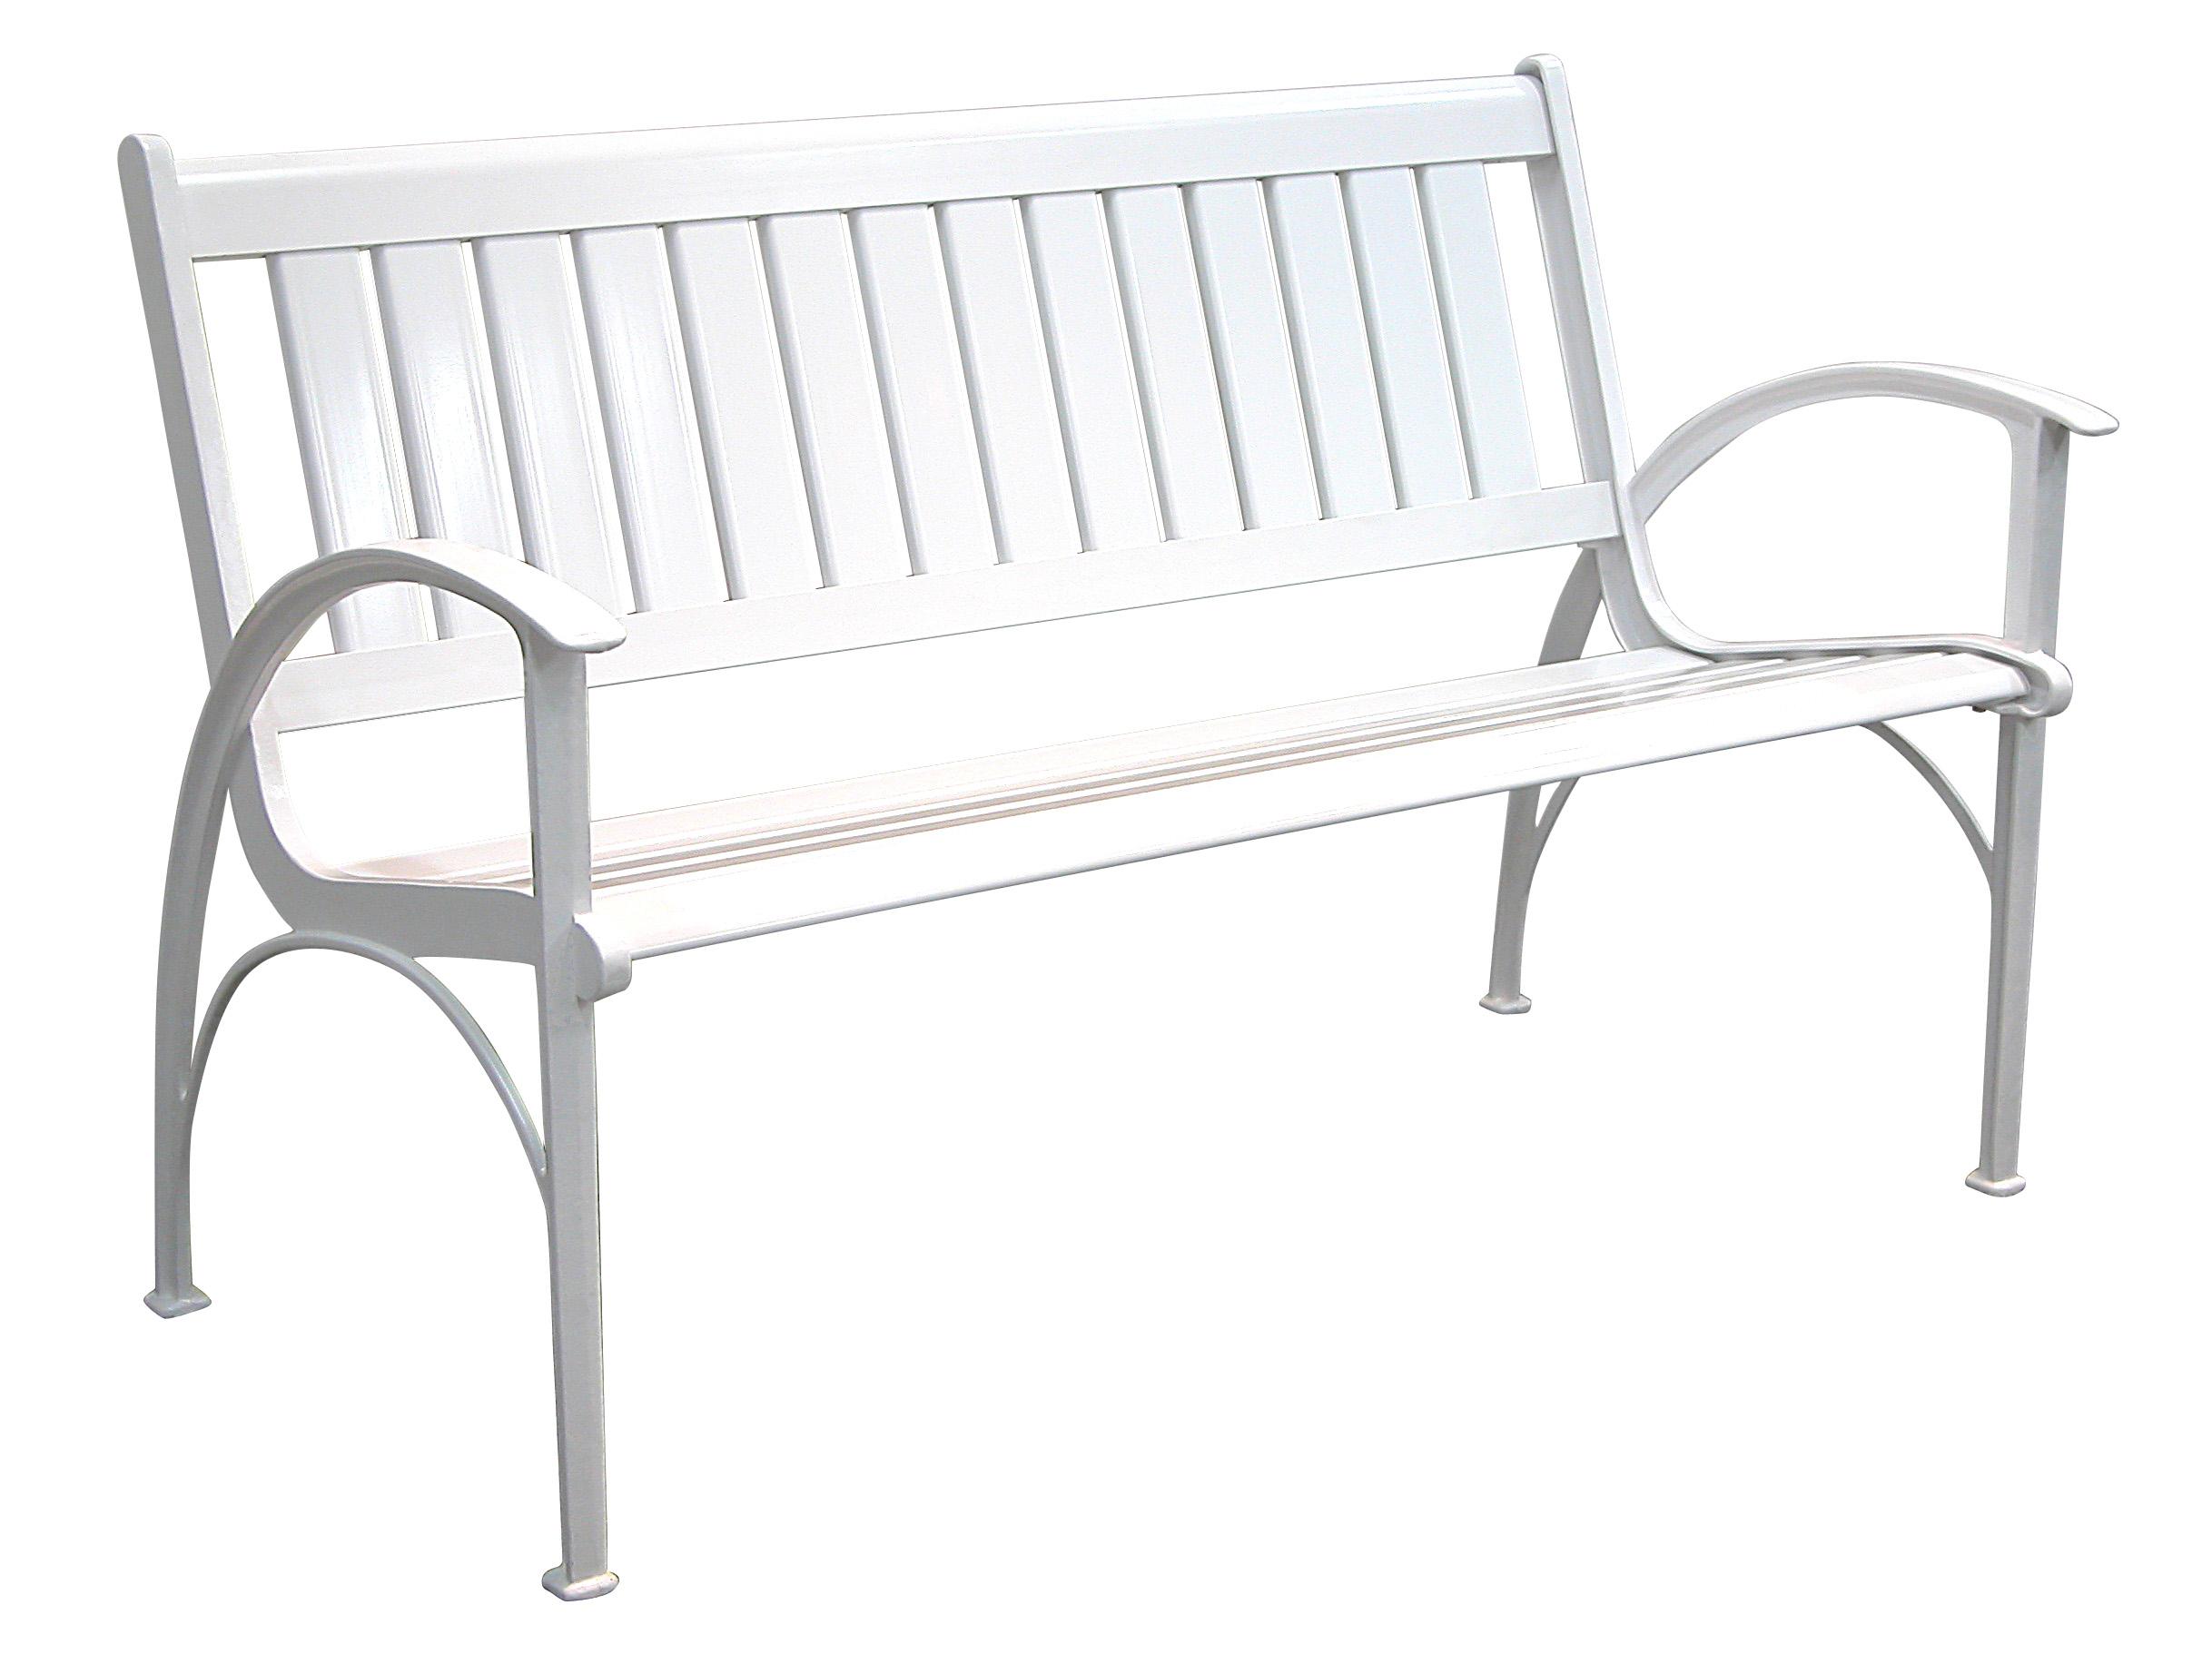 Patio Furniture Bench Contemporary Cast Aluminum White